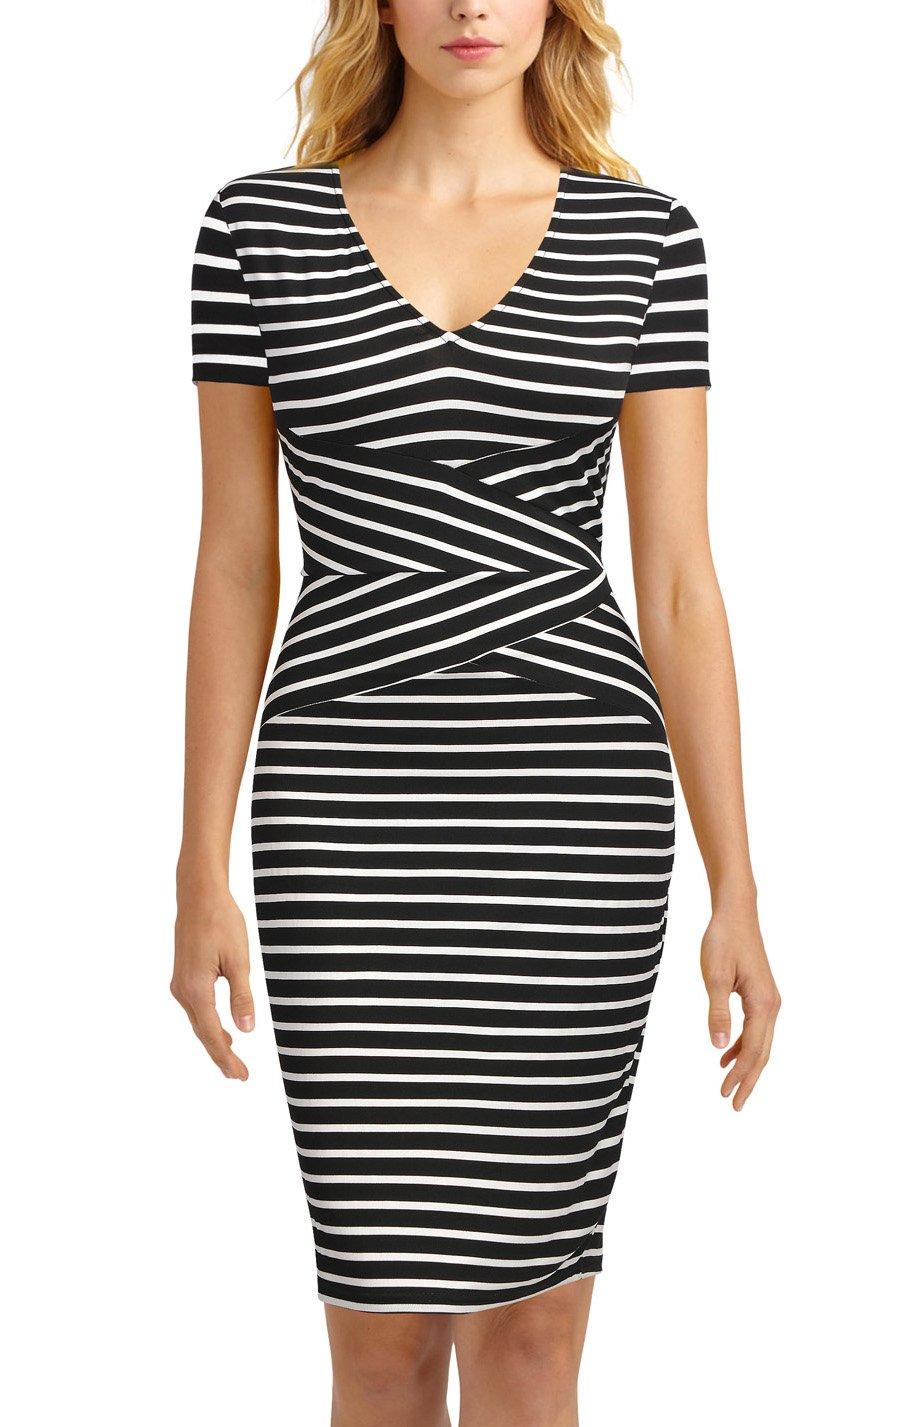 Mmondschein Women Short Sleeve Striped Wear to Work Business Pencil Dress L Black